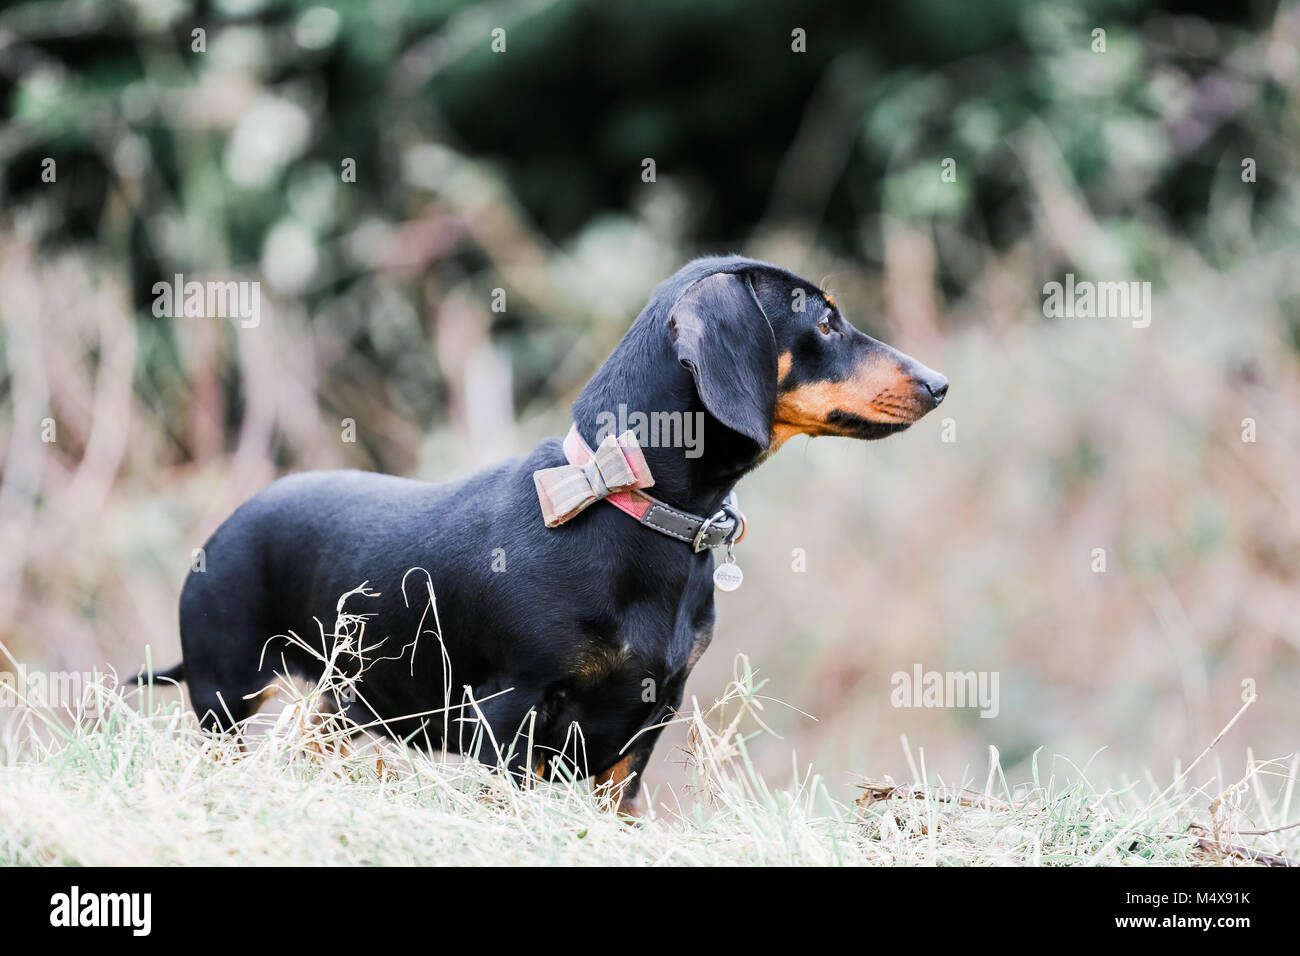 Minidachshund auf einem Hund Spaziergang im Grünen, Oxfordshire, UK Stockfoto